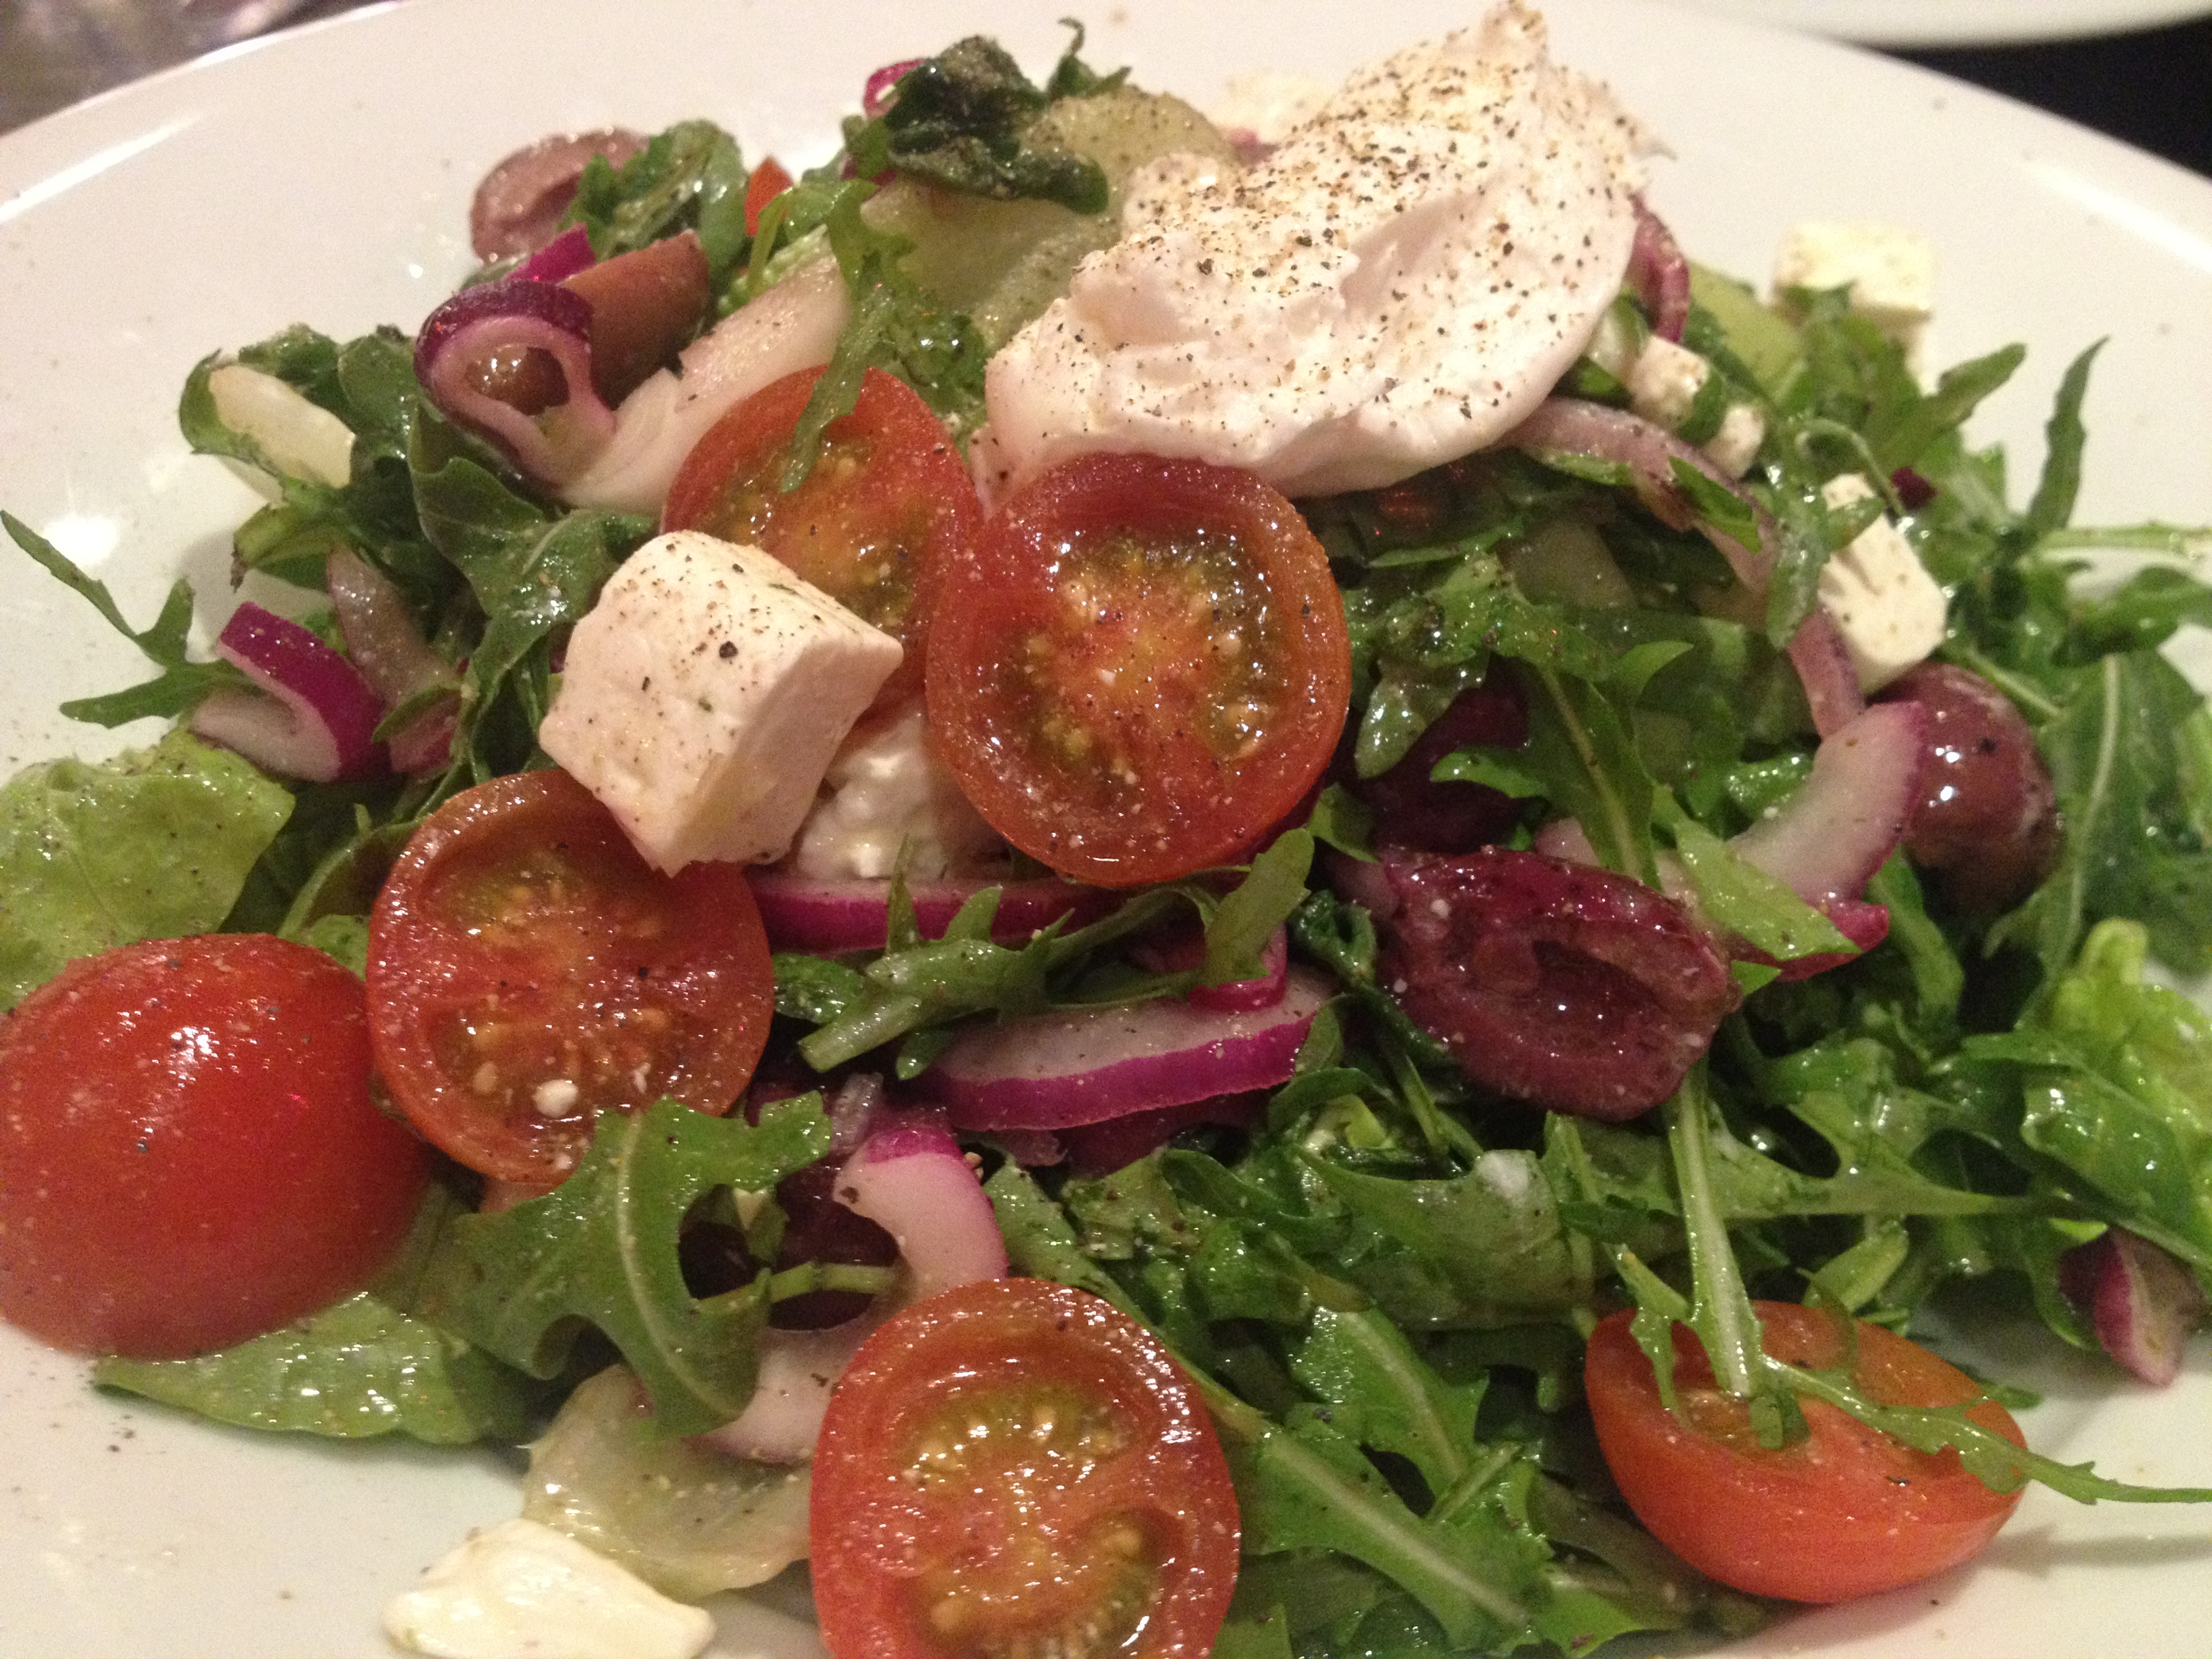 Papa g 39 s offers authentic greek cuisine styleetc for Authentic greek cuisine